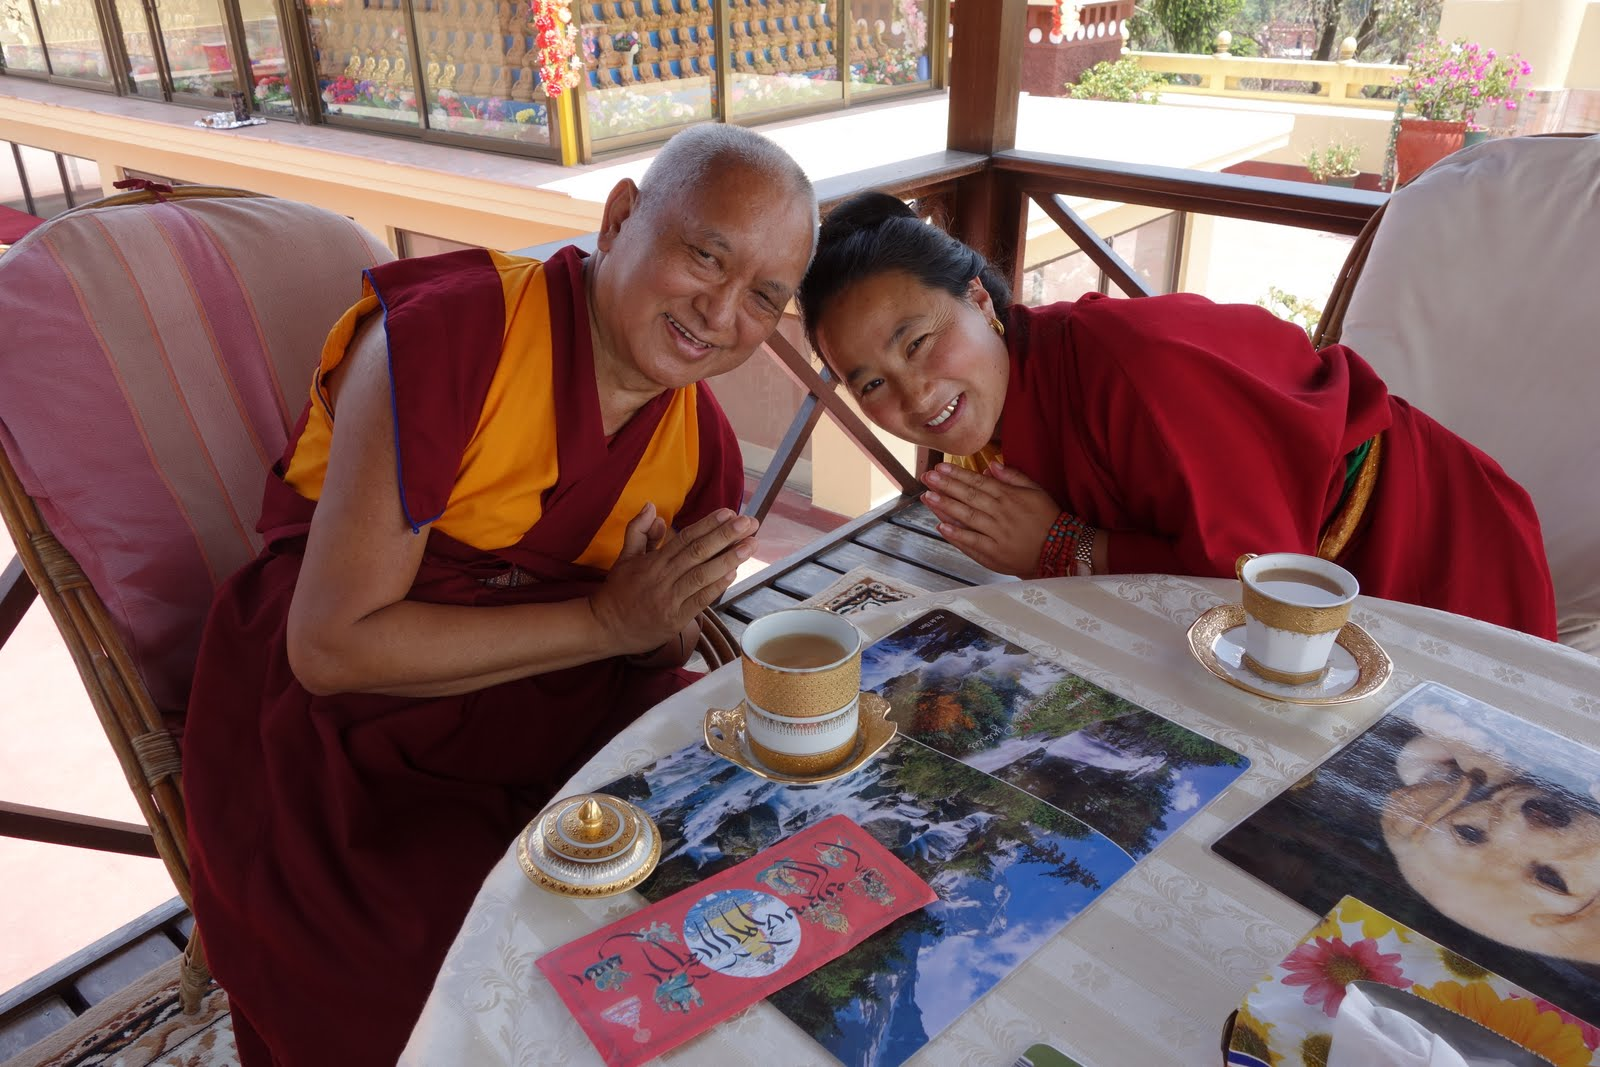 RinpocheandKhadro-latogetherhavingteafollowing thelonglifepujaatKopan.Photo by Ven.RogerKunsang